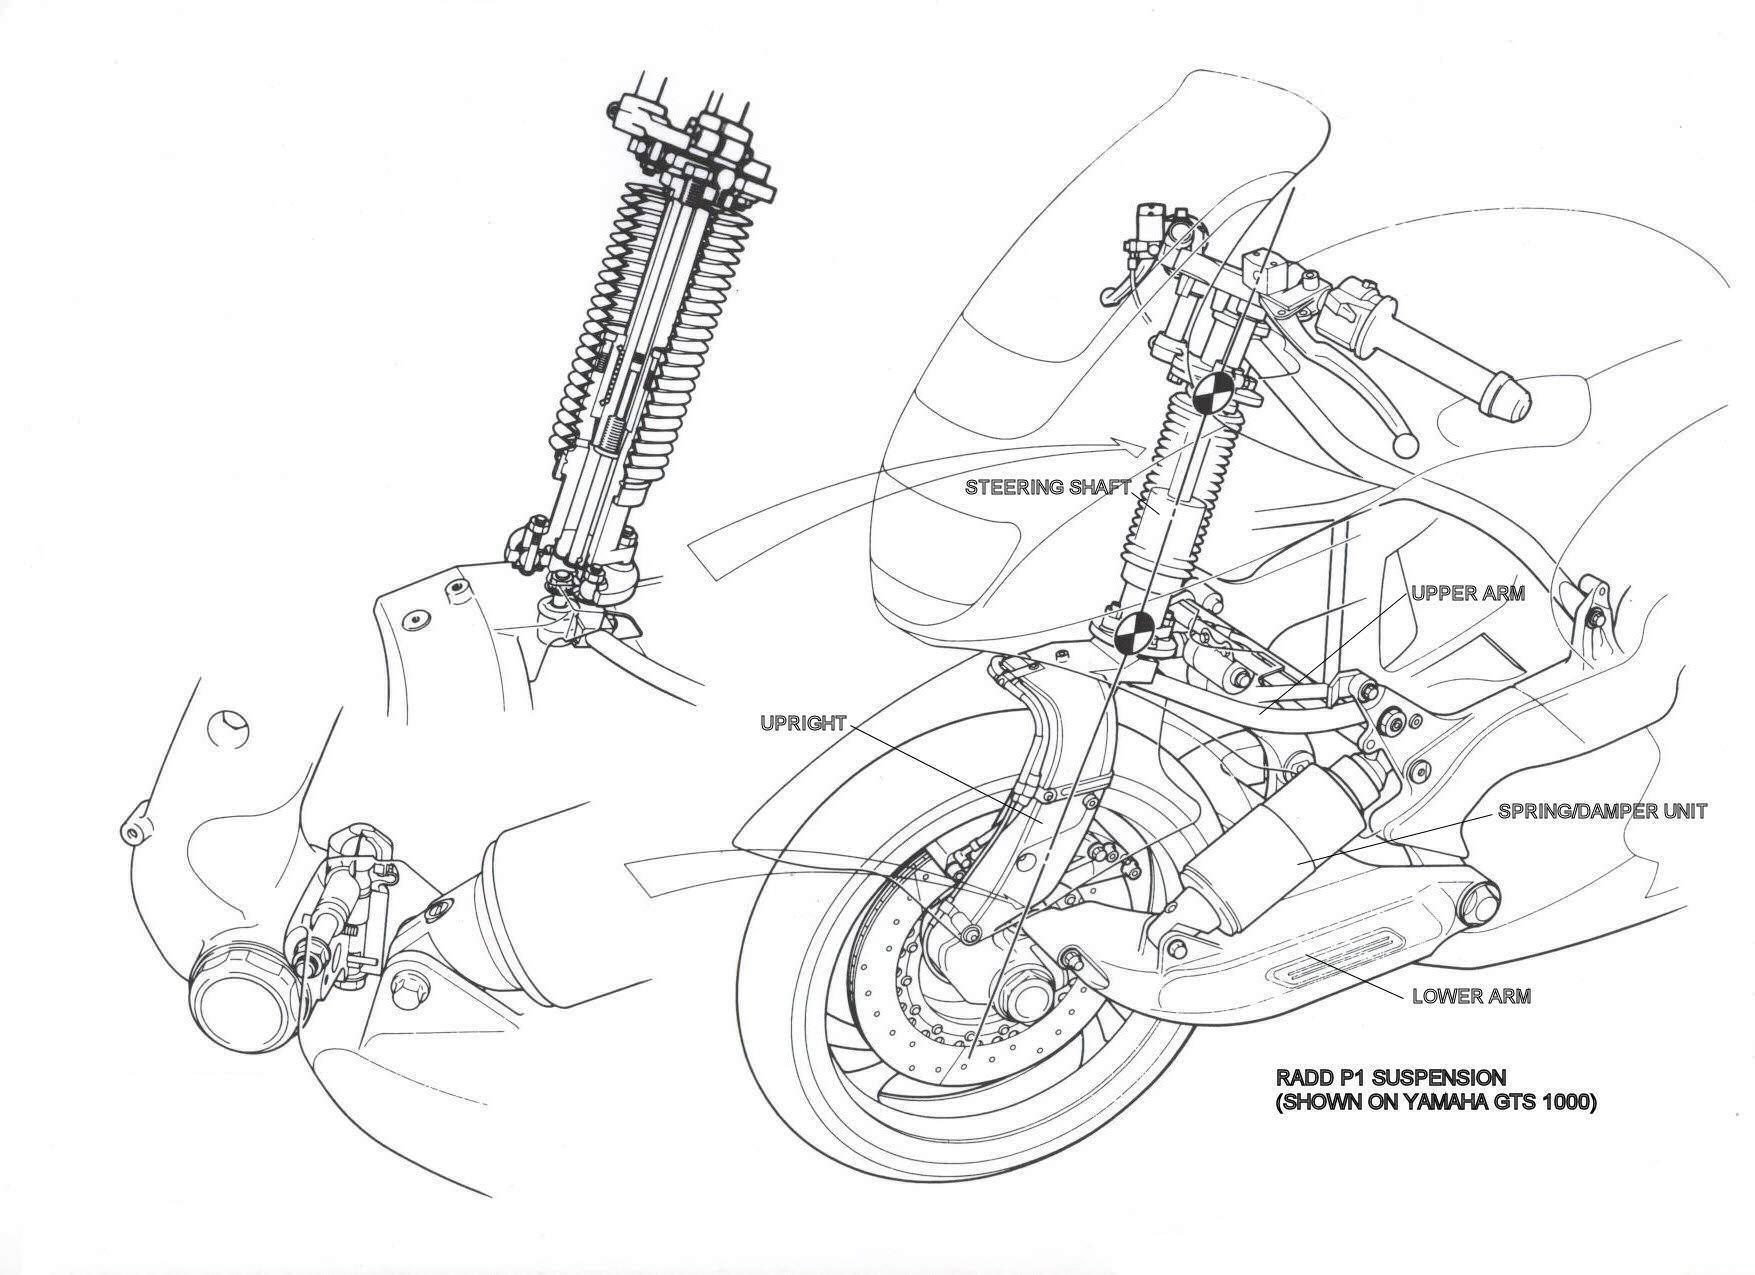 The Jsk Moto Co Custom Yamaha Gts Project Rhodium